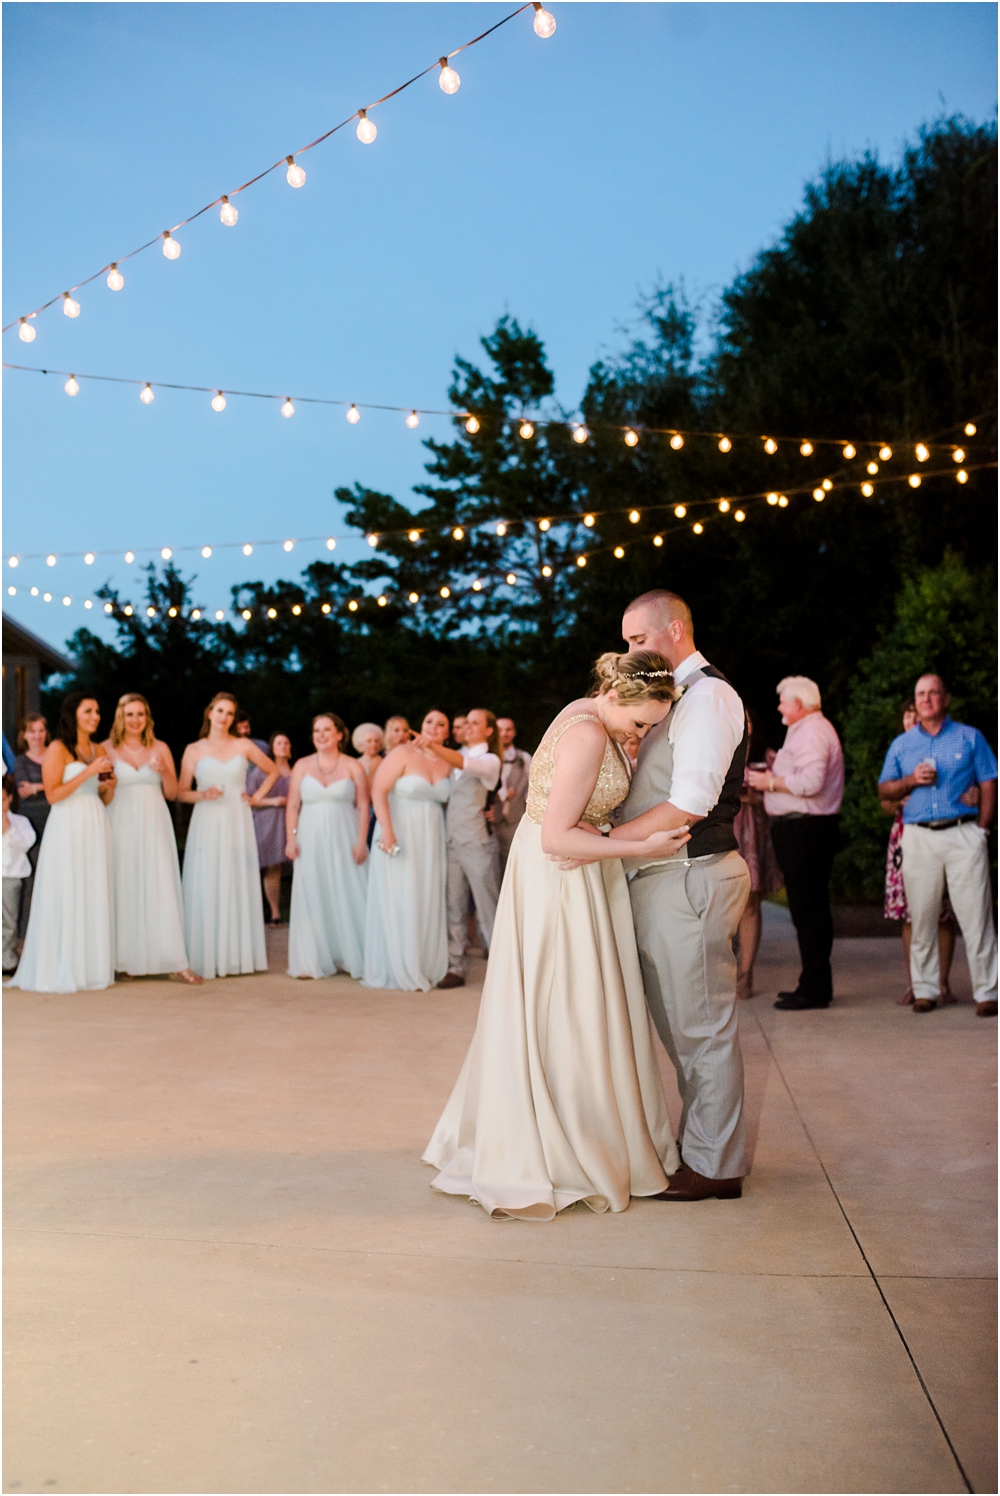 matthew-wedding-kiersten-stevenson-photography-30a-panama-city-beach-dothan-tallahassee-(439-of-579).JPG